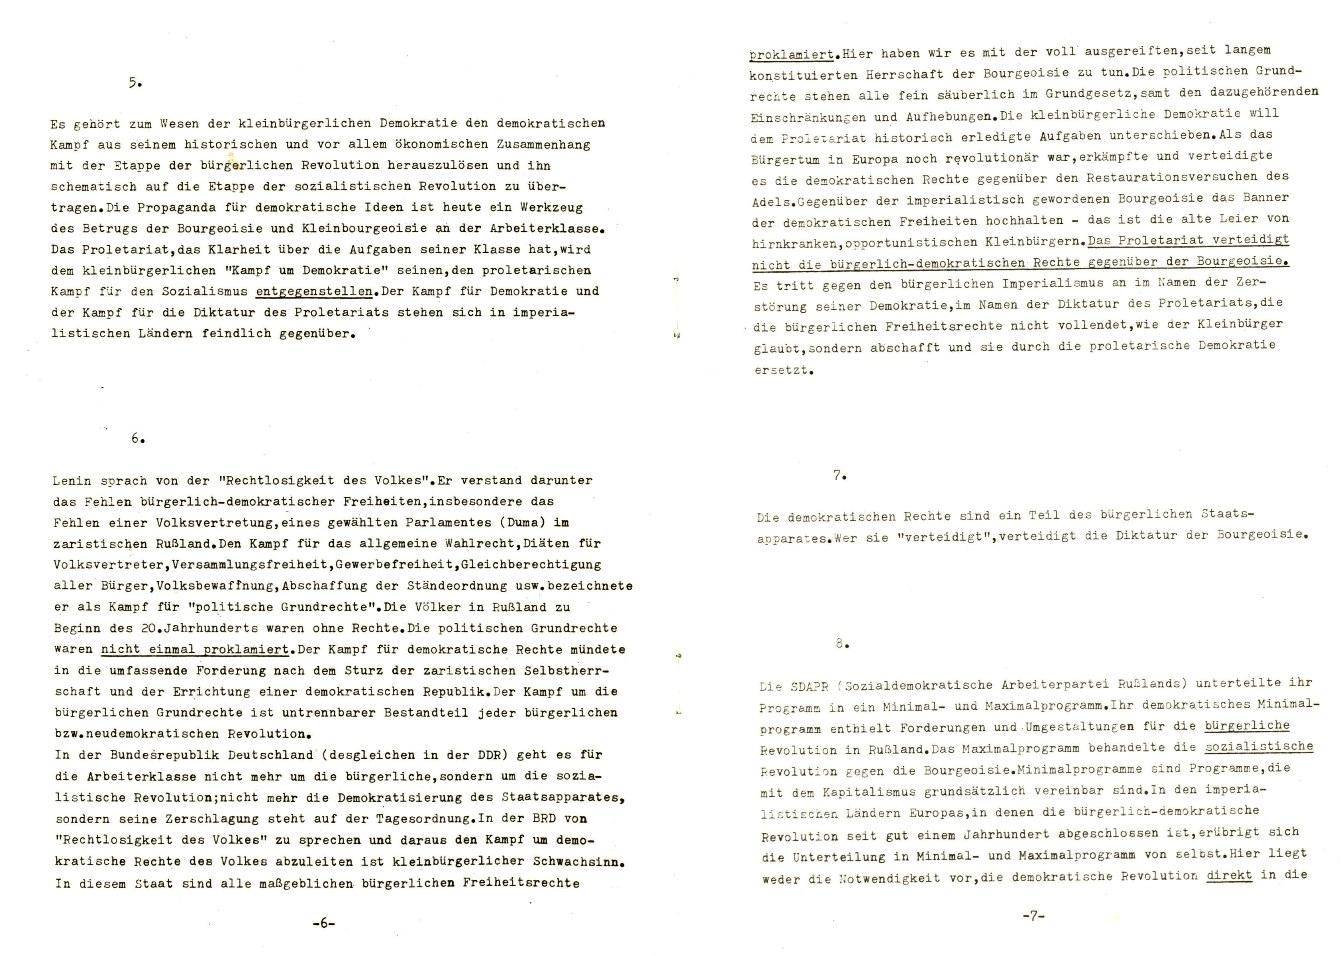 Muenchen_Kampf_dem_Revisionismus_1978_06_04